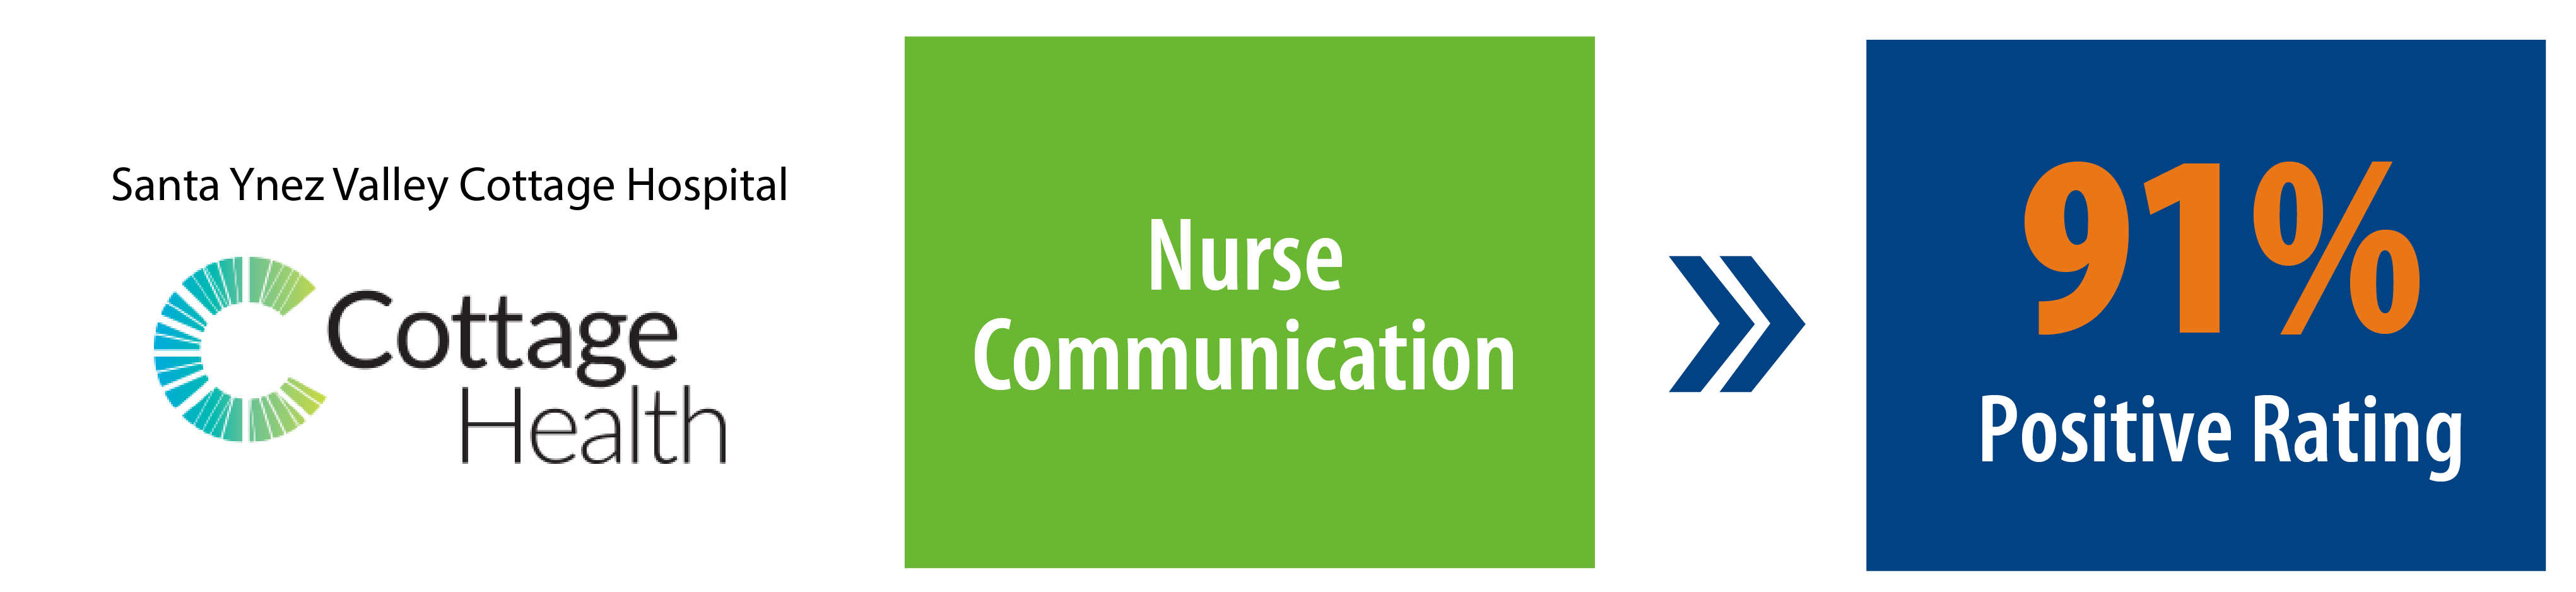 91% Positive Rating Nurse Communication